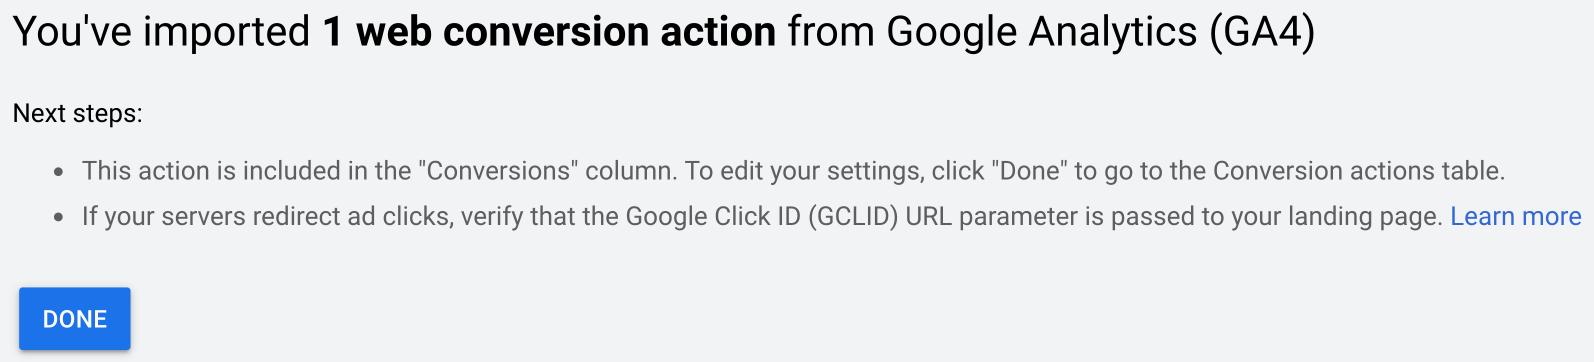 Successful Import of GA4 Conversions Screen in Google Ads | AZ Creates